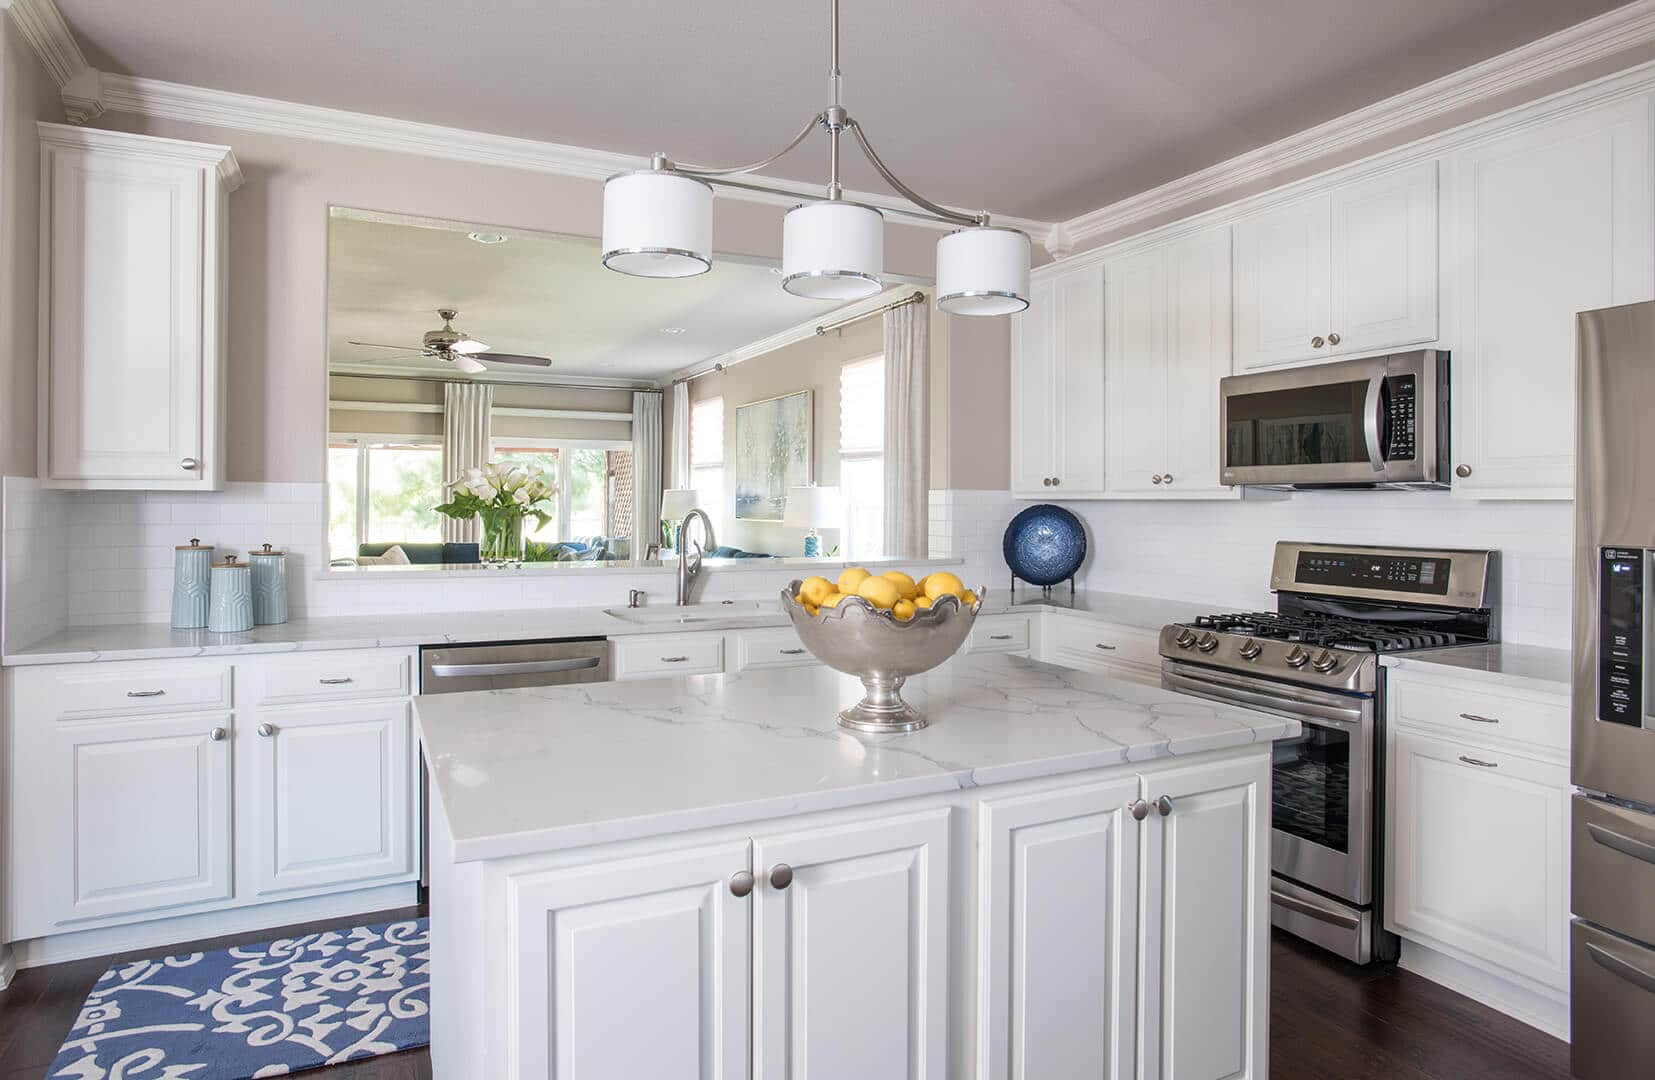 Blue & White Kitchen Decorating Ideas | Dallas Interior Designer | Dallas Interior Decorator